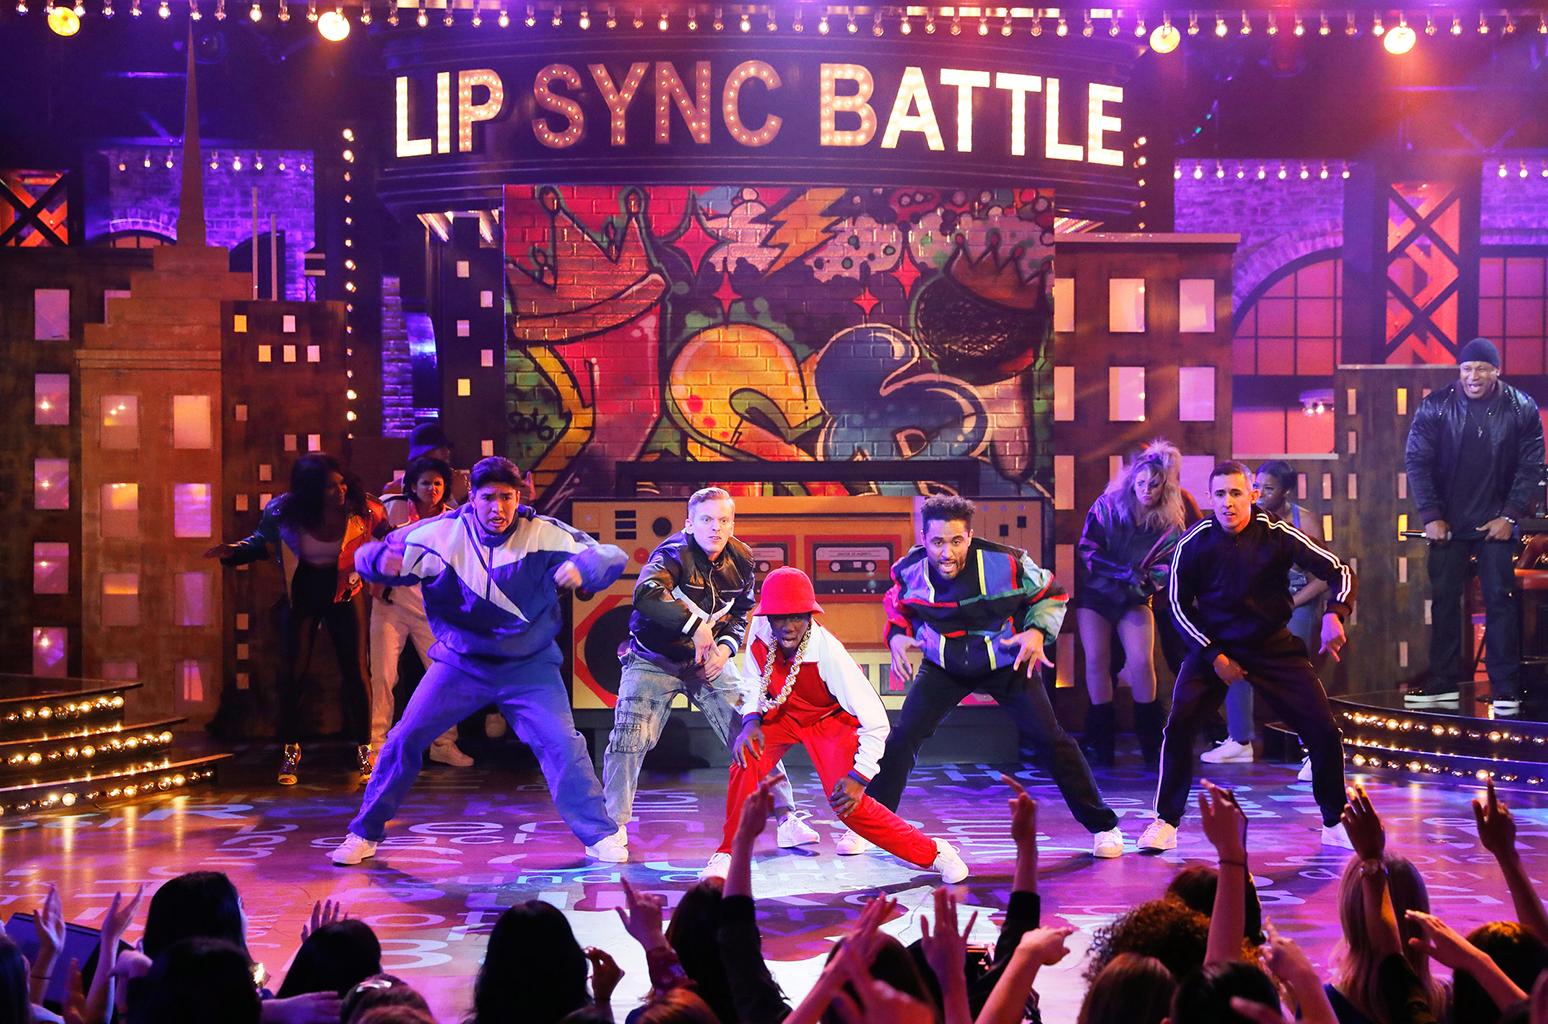 Caleb-McLaughlin-lip-sync-battle-2017-billboard-1548.jpg